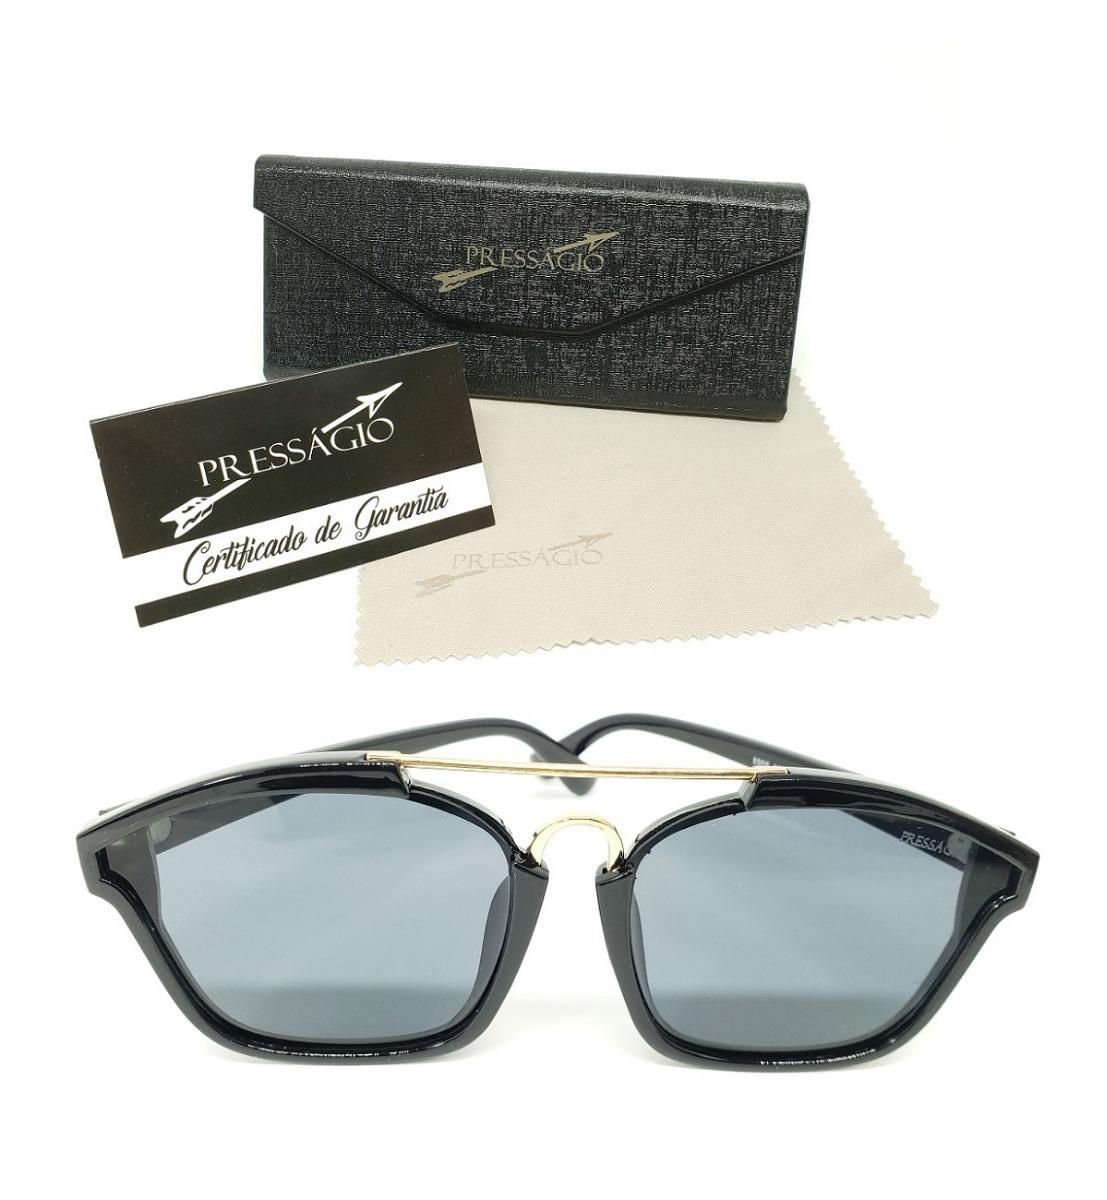 dee0486b0ed07 óculos de sol gatinho retro feminino psg-8905p + brinde. Carregando zoom.